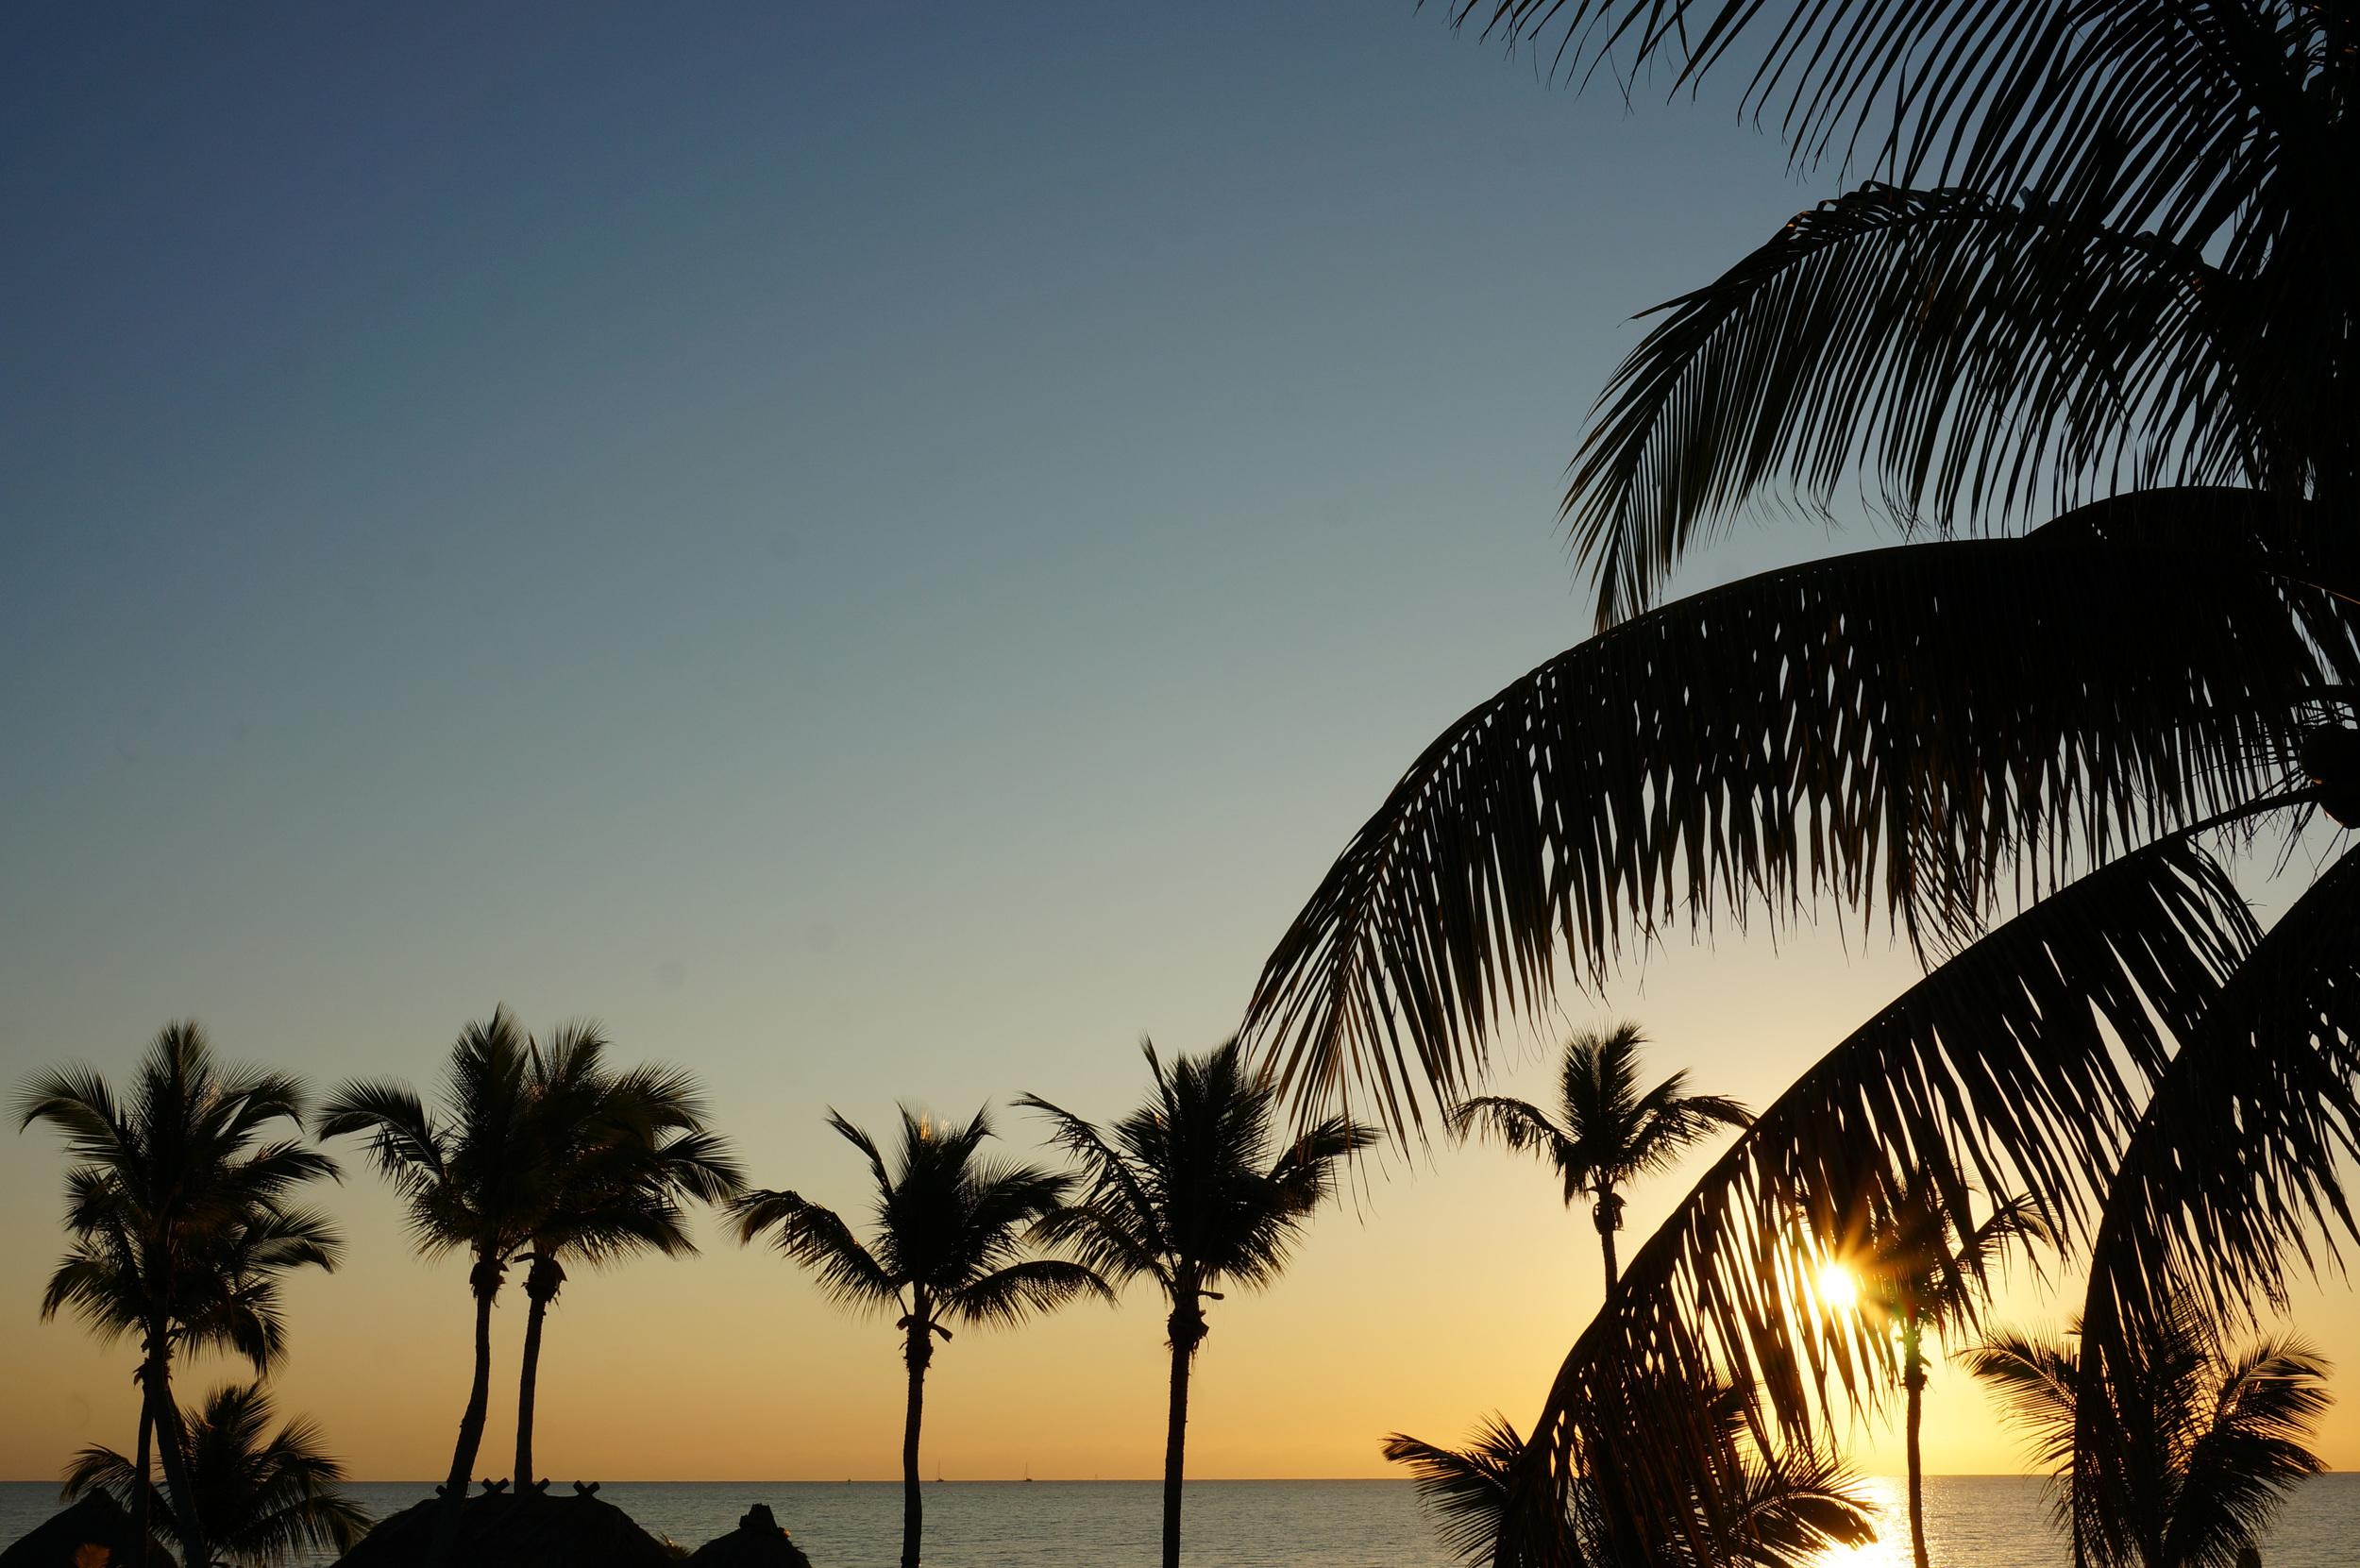 Sunrise and palm trees